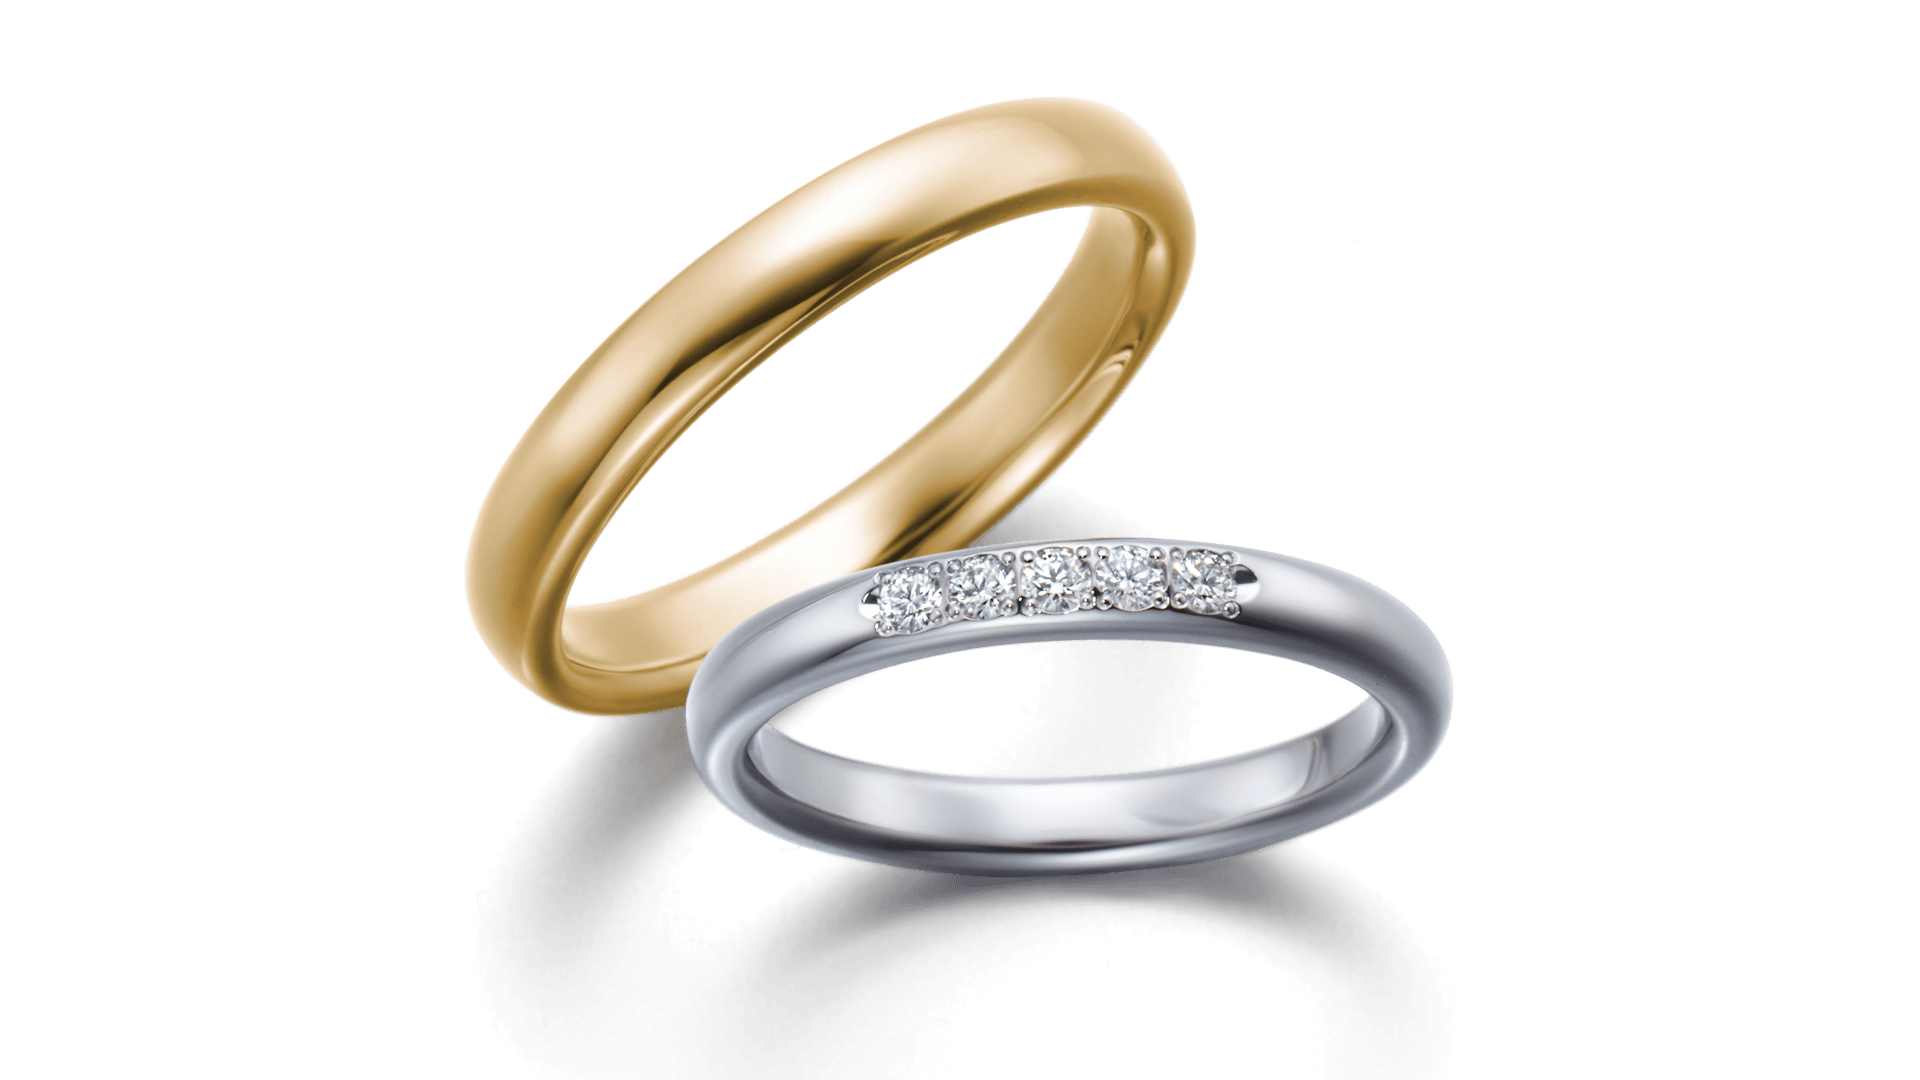 Origin Belief03 オリジンビリーフ03 | 結婚指輪サムネイル 2